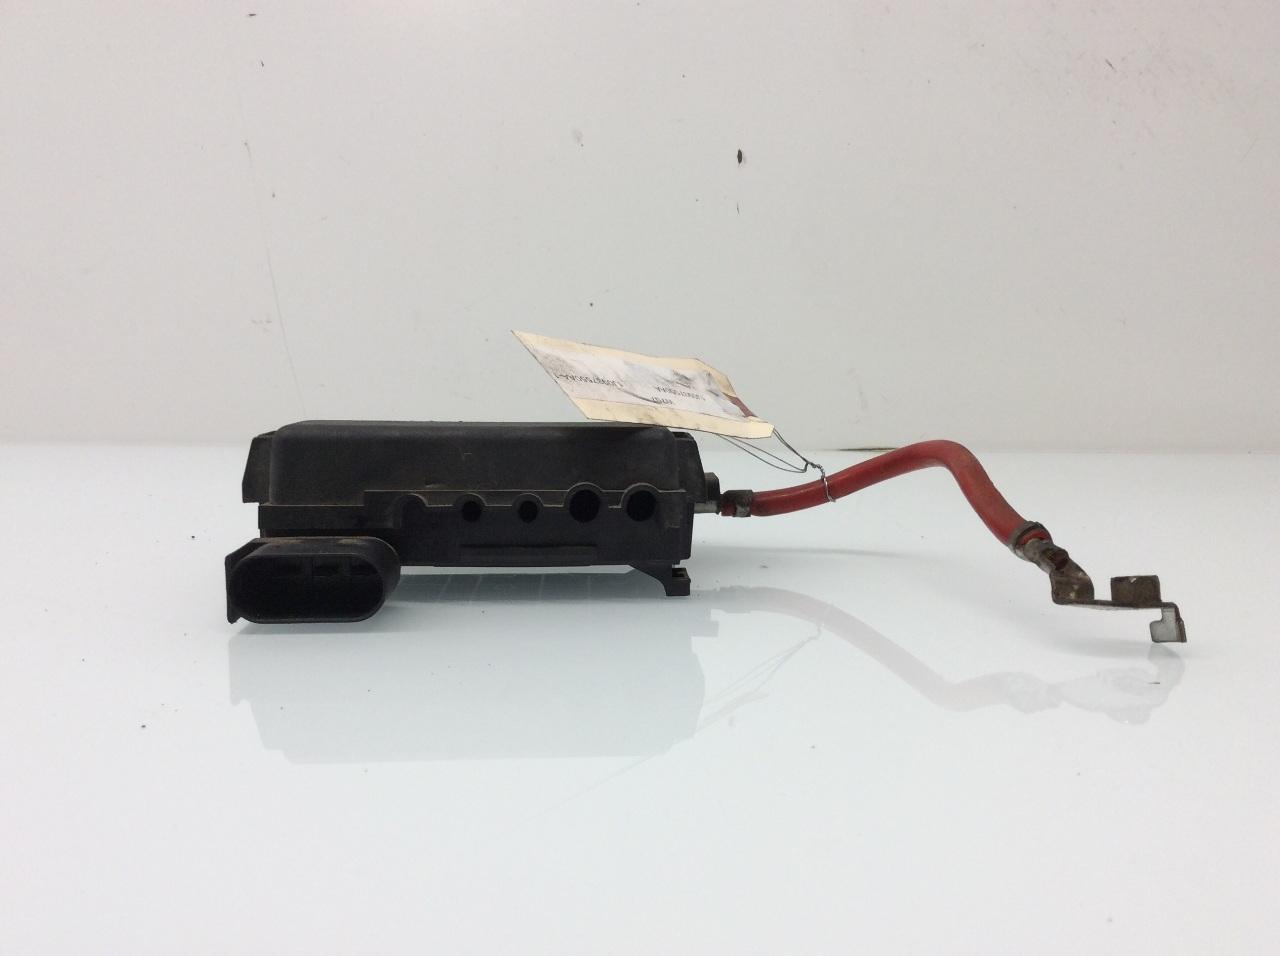 2003 Vw Jetta Battery Fuse Box Free Wiring Diagram For You Volkswagen Gls Car Interior Design Passat